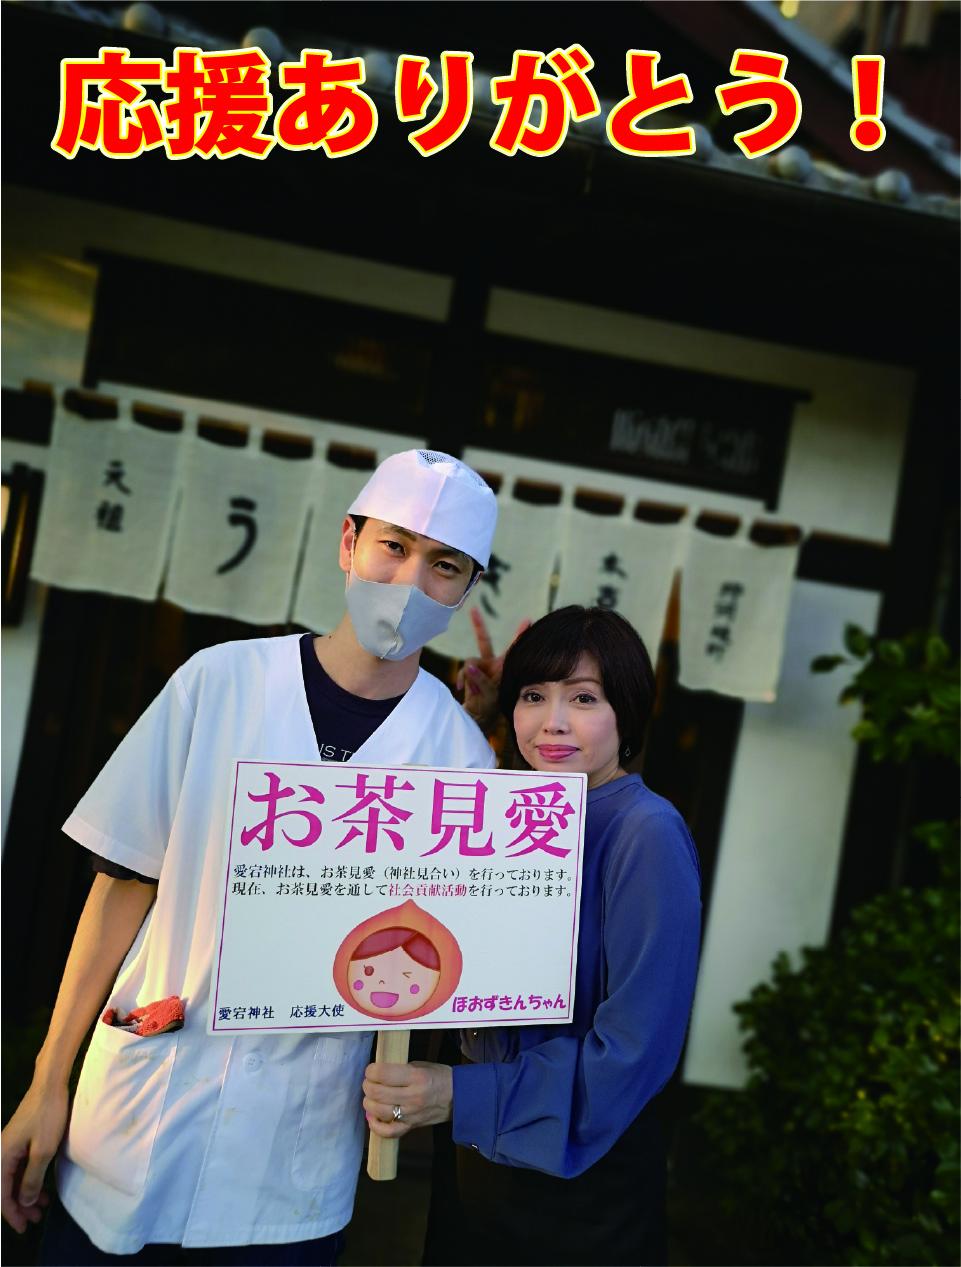 fukuoka-lp2_20210527_3-art-23-80